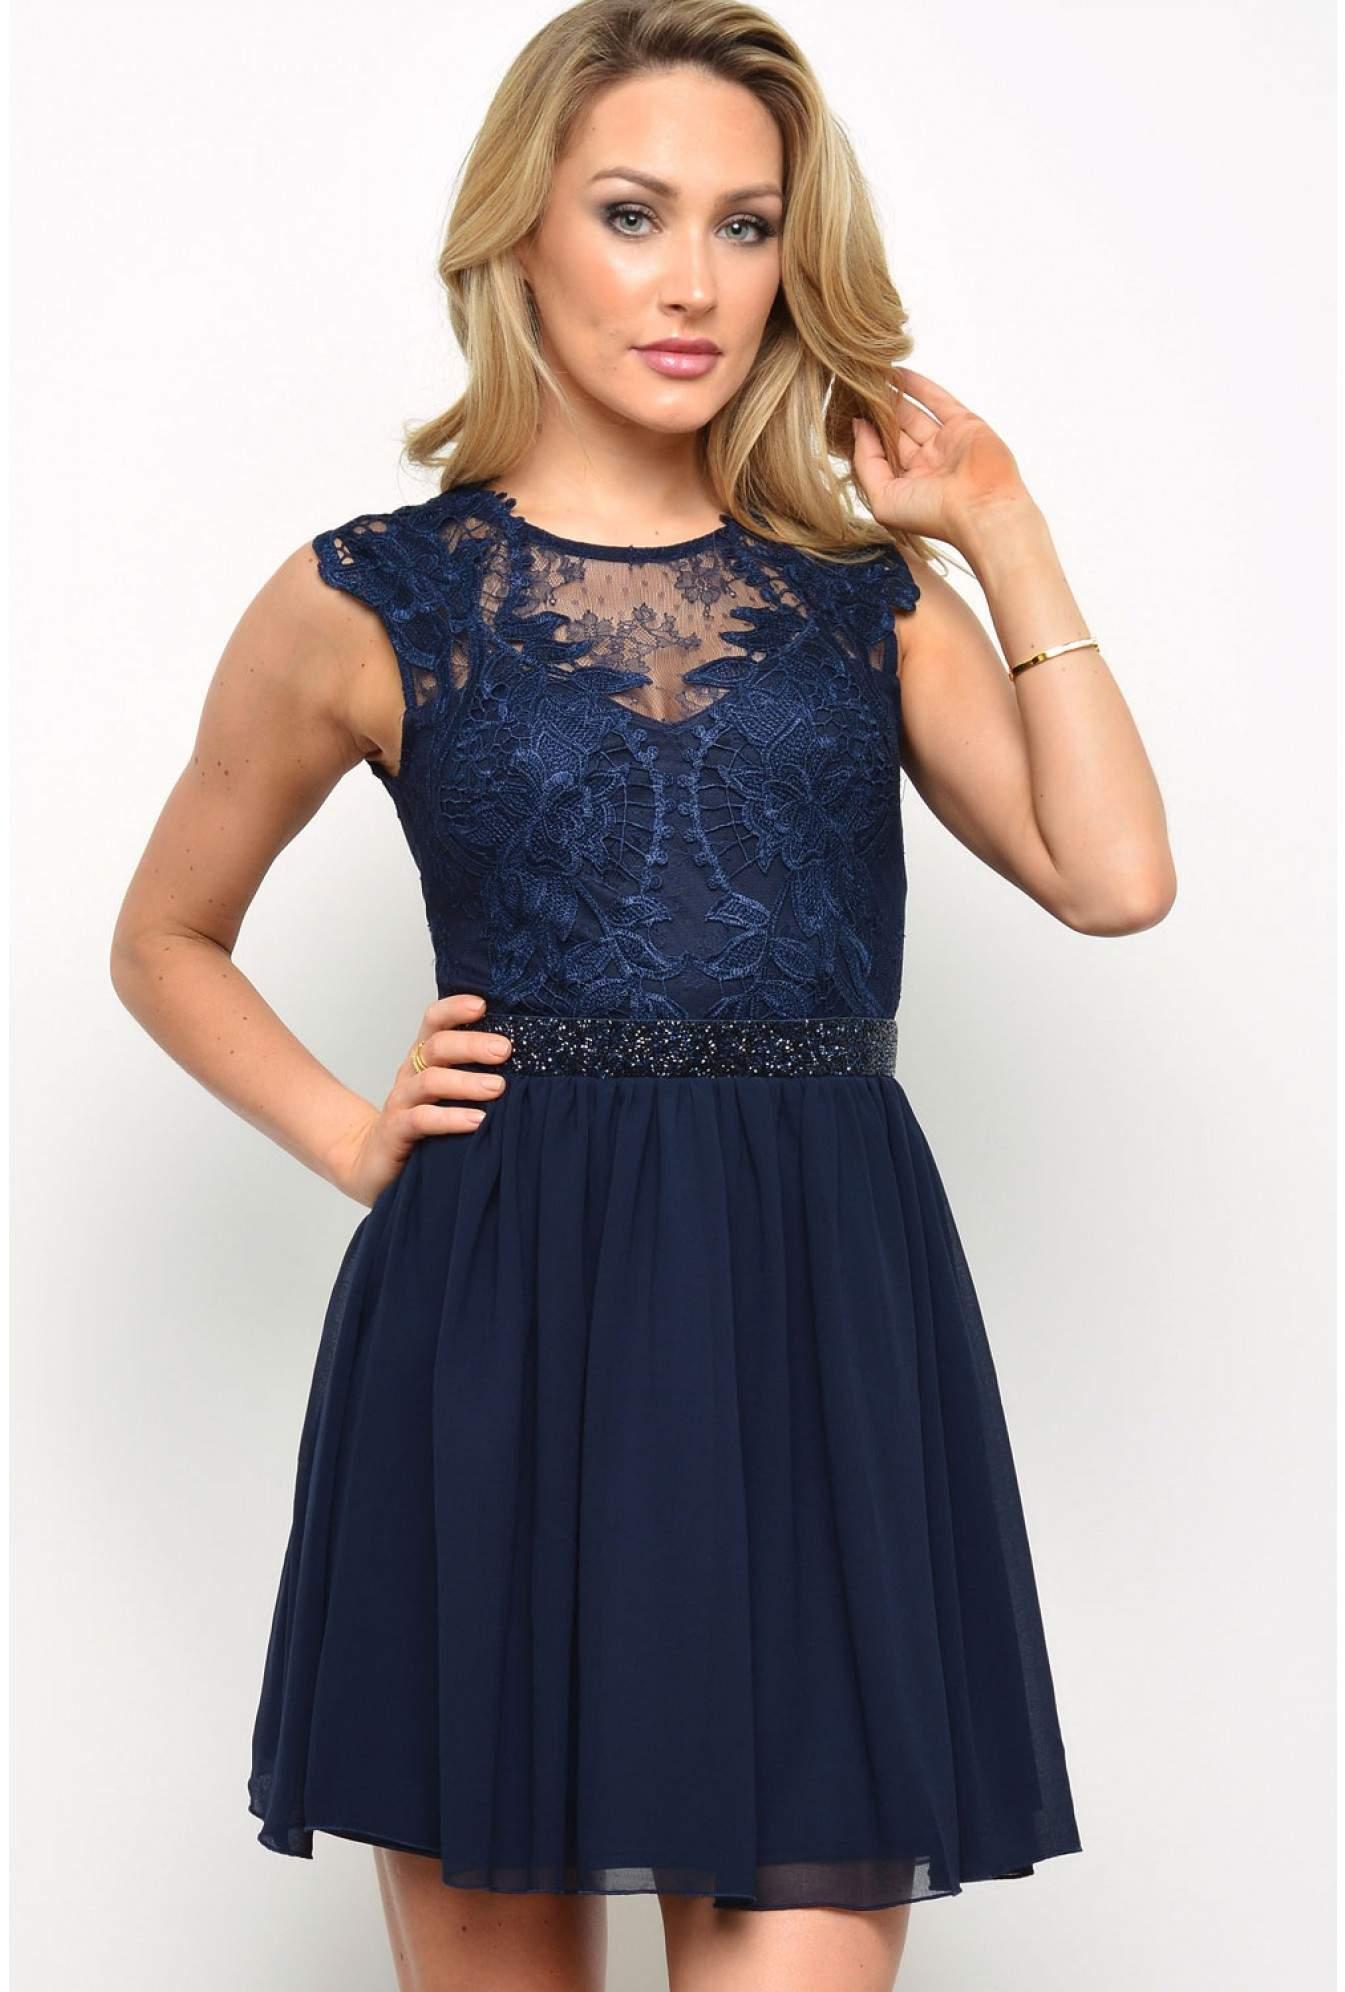 715ba7368e Lipsy Lipsy Lace Top Prom Dress in Navy   iCLOTHING